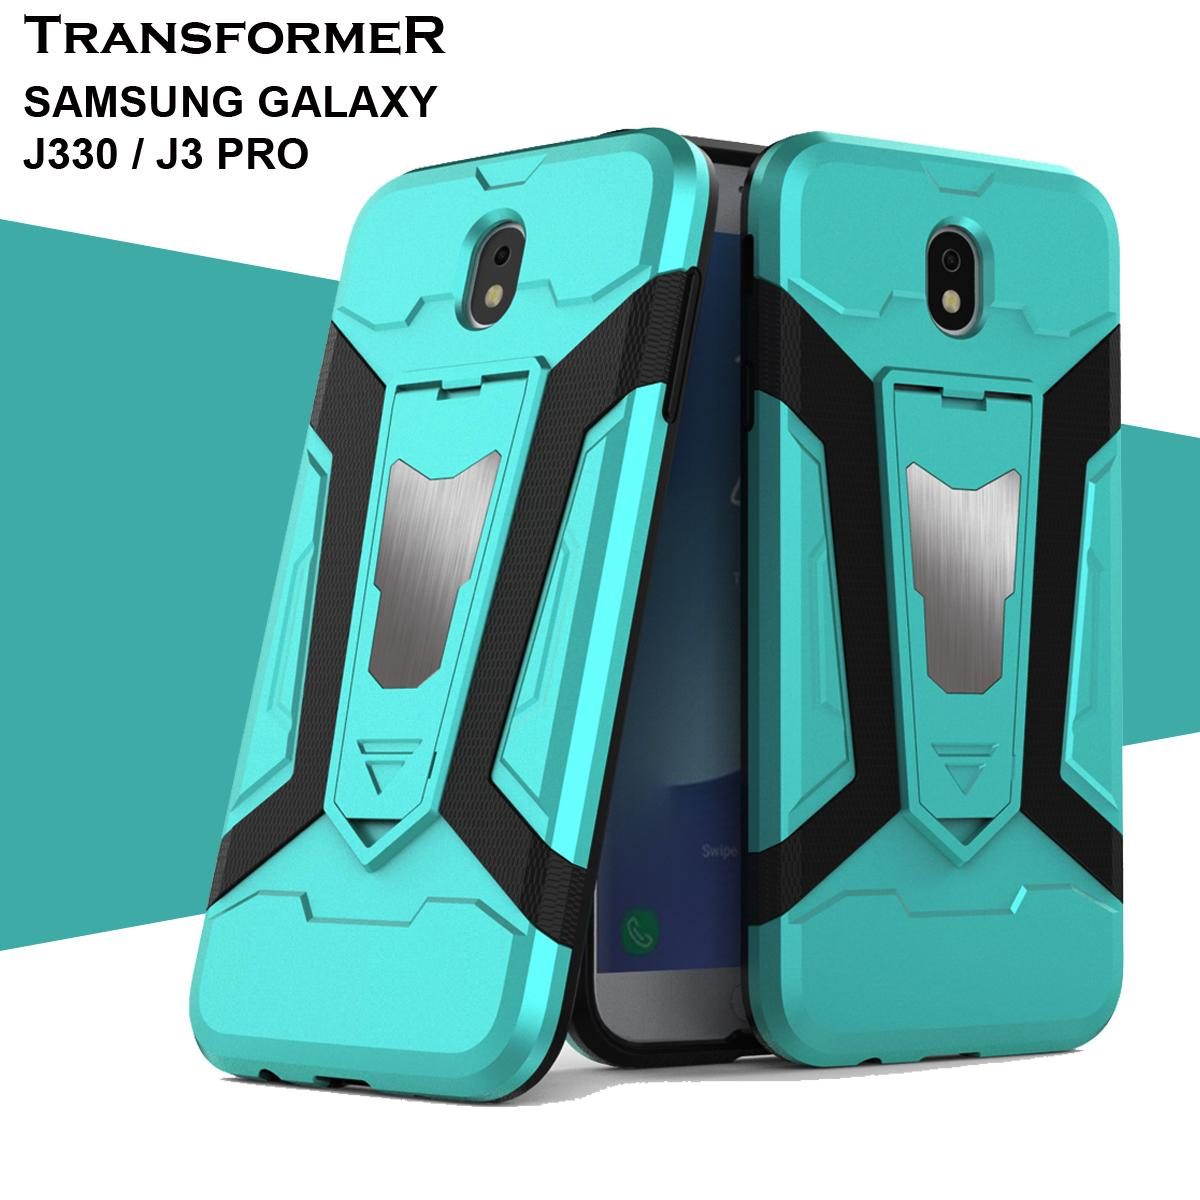 Case Iron Man for Samsung Galaxy J3 Pro / J330 / SAMSUNG J3 PRO Robot Transformer